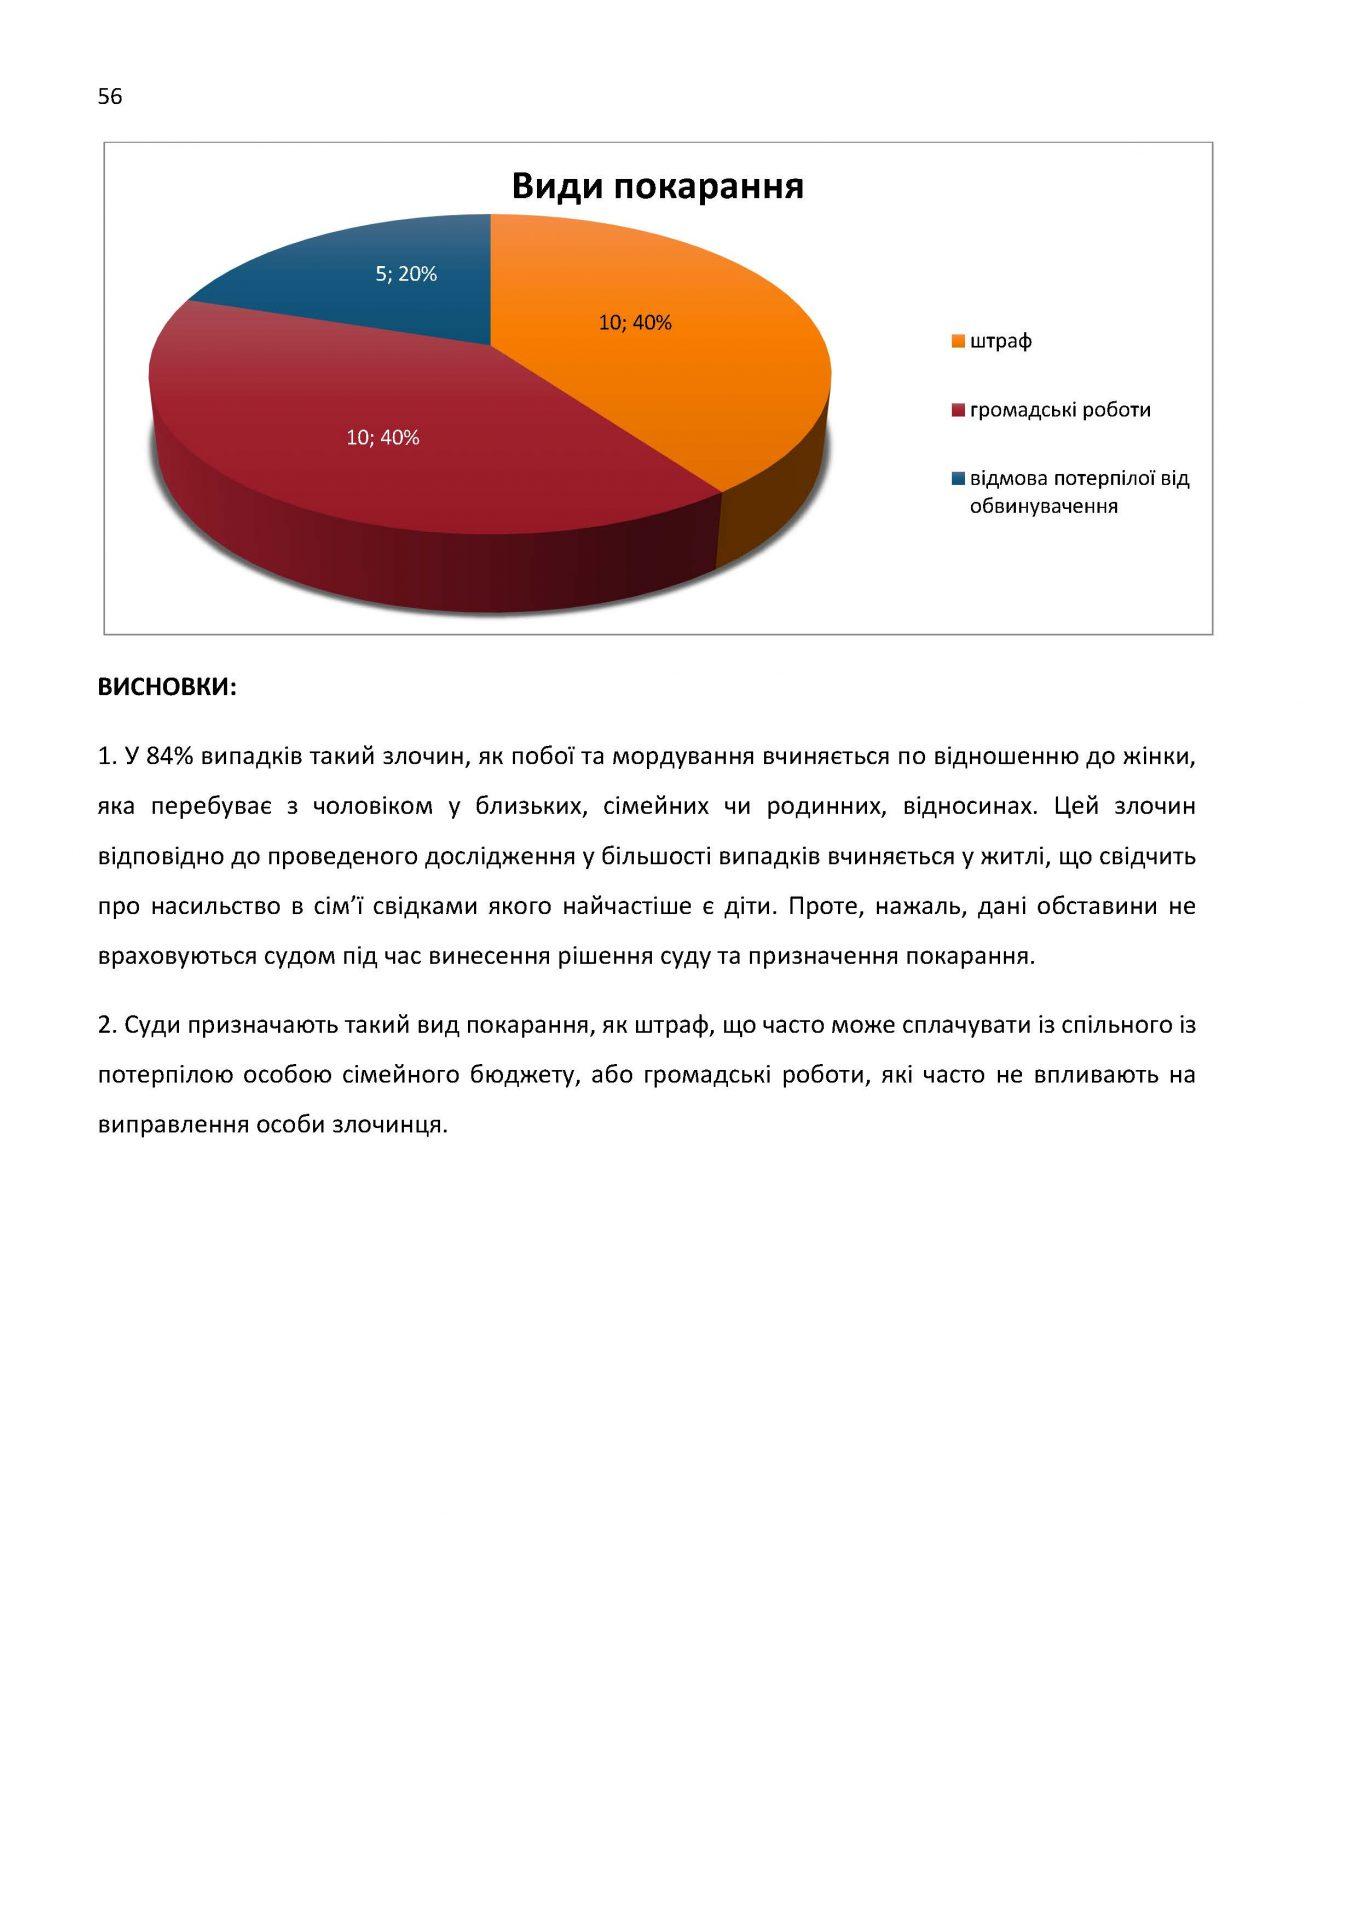 Draft Report monitoring print USAID_Страница_56